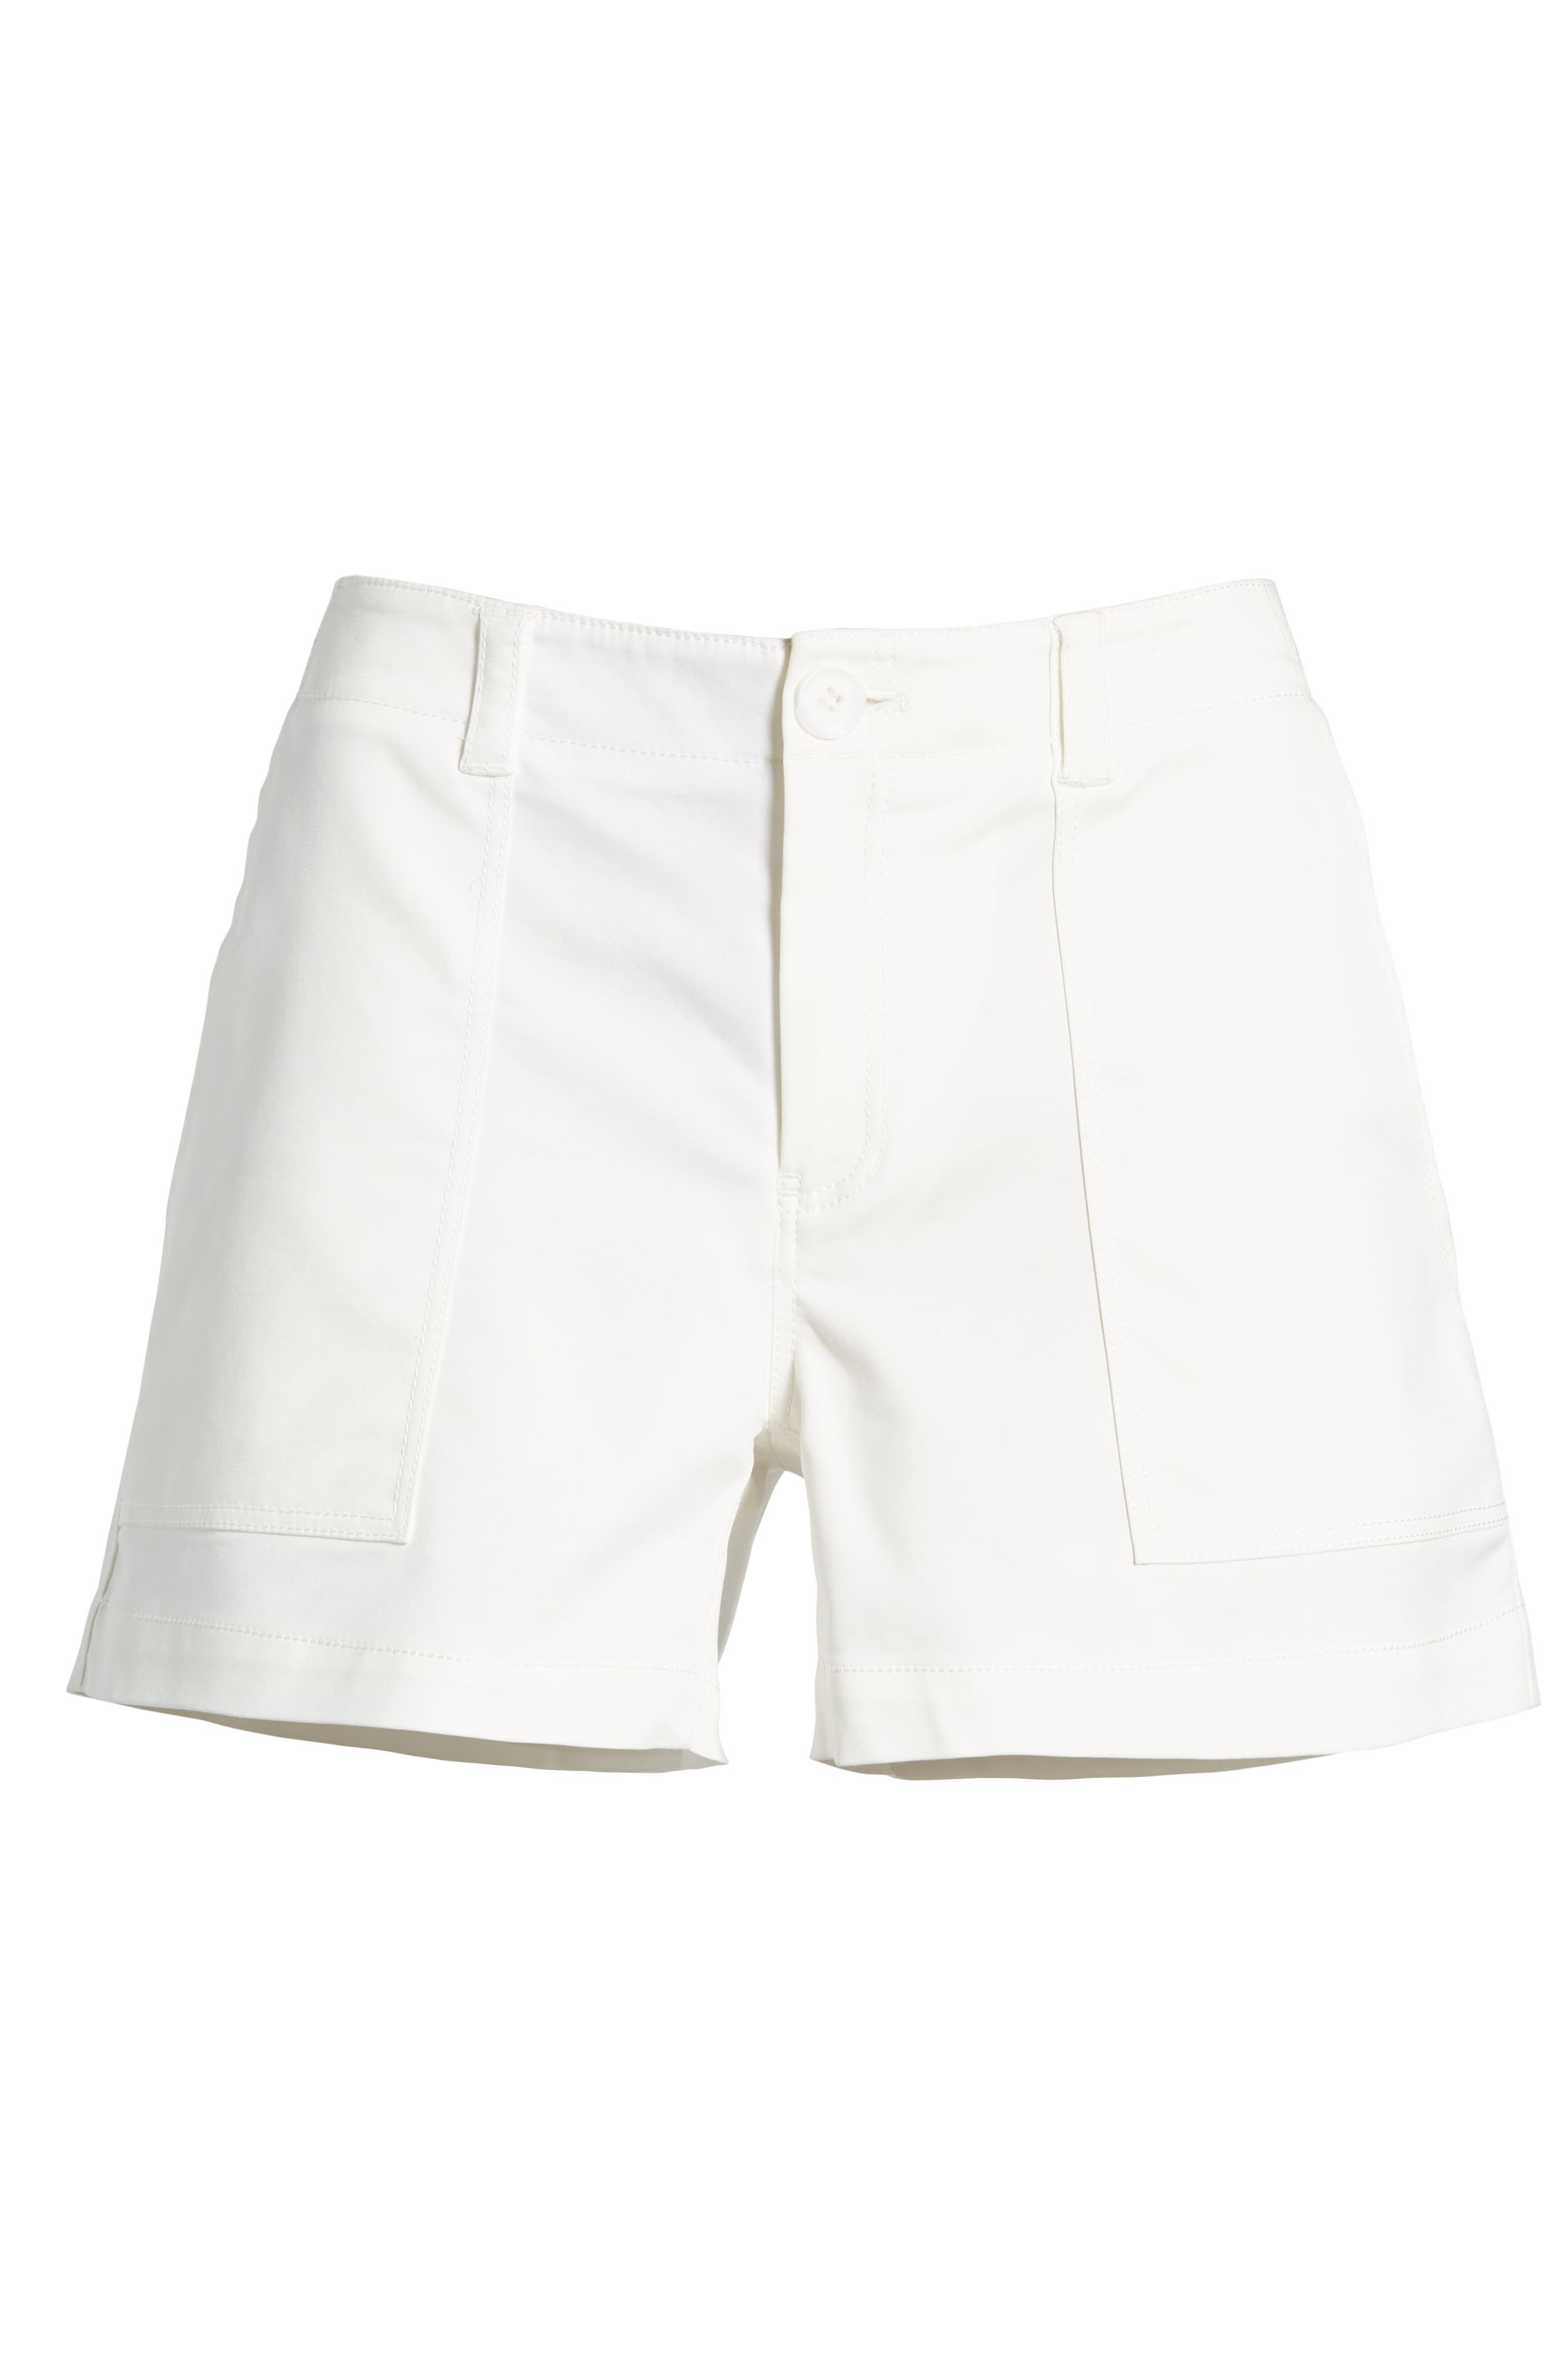 Patch Pocket Shorts,                             Alternate thumbnail 6, color,                             100